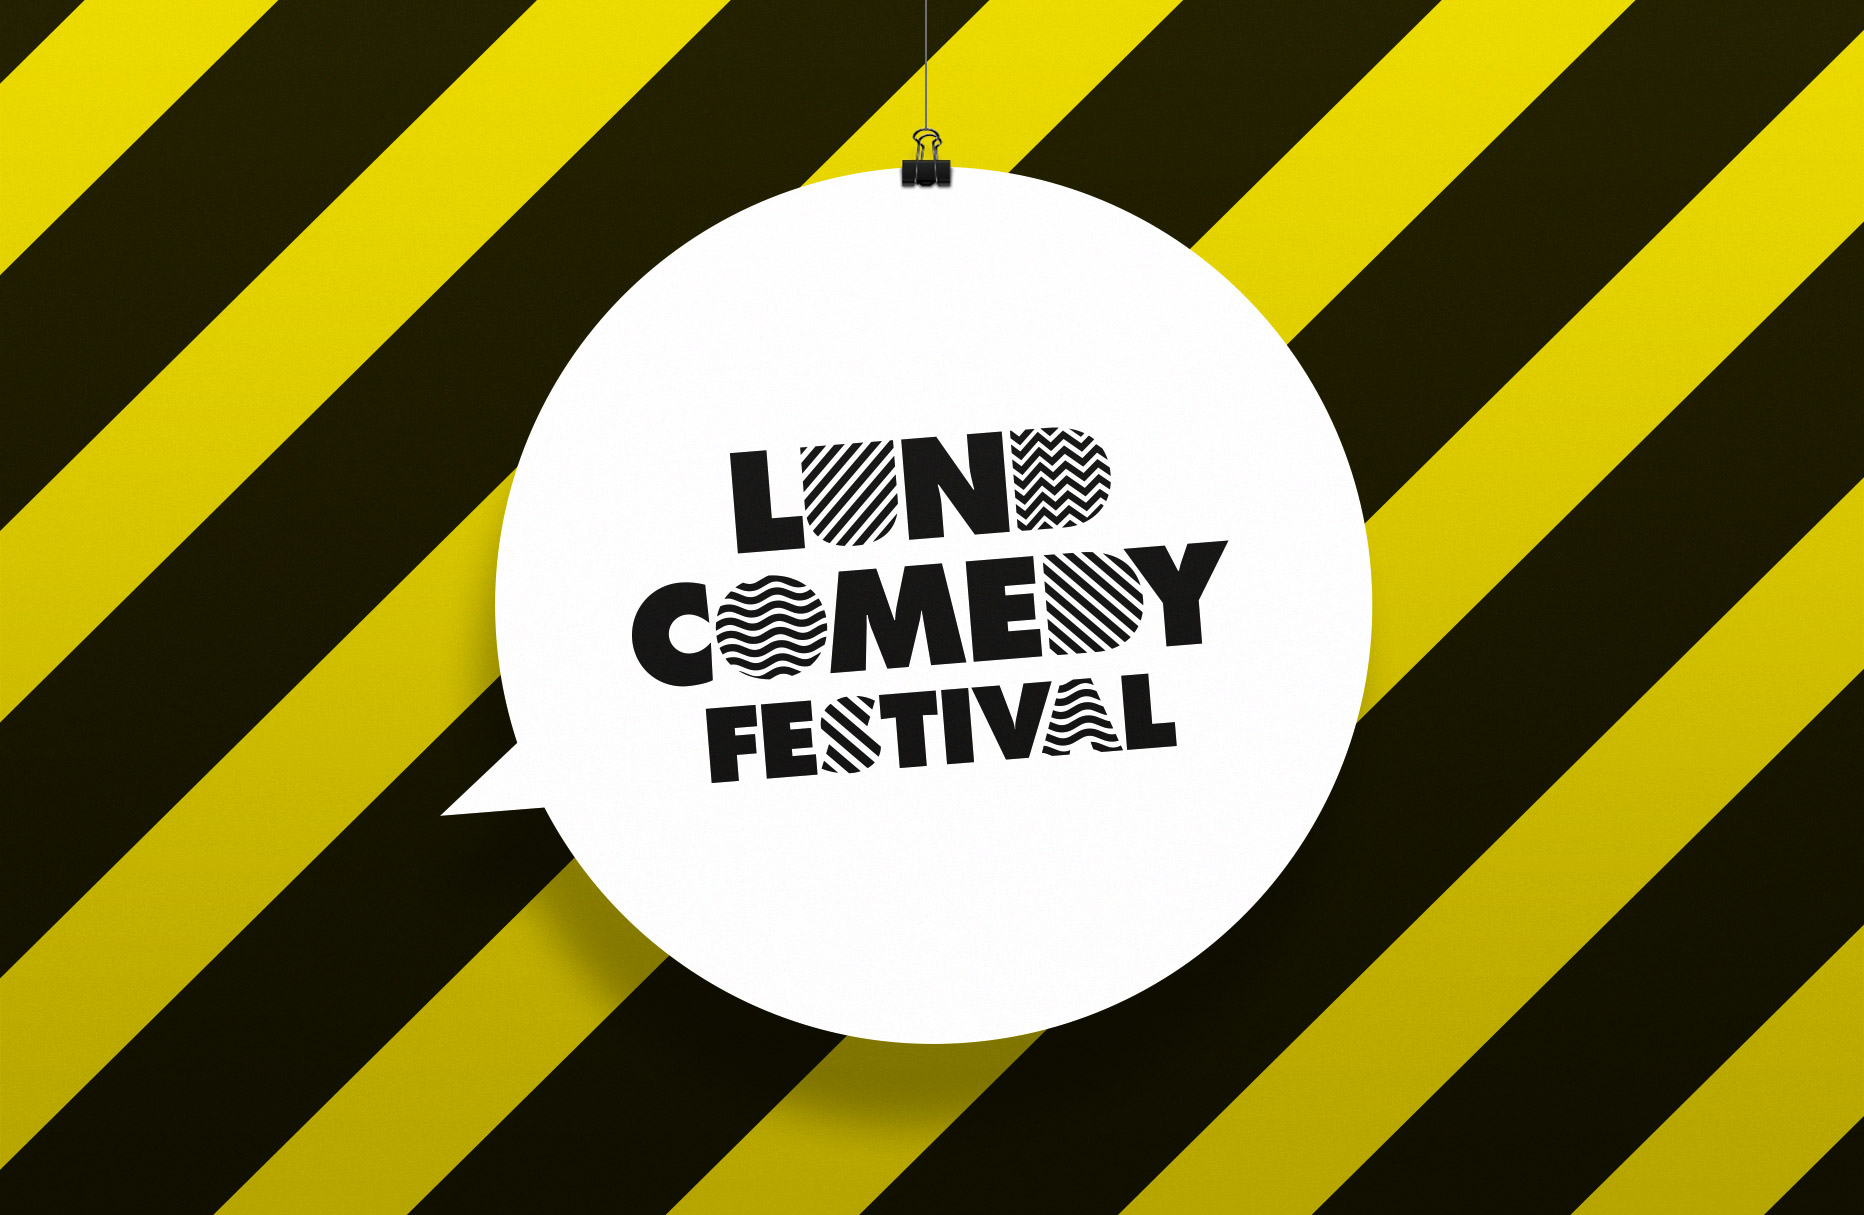 Anagram_Lund-Comedy-Festival-2014-logo-hanging-kolossal